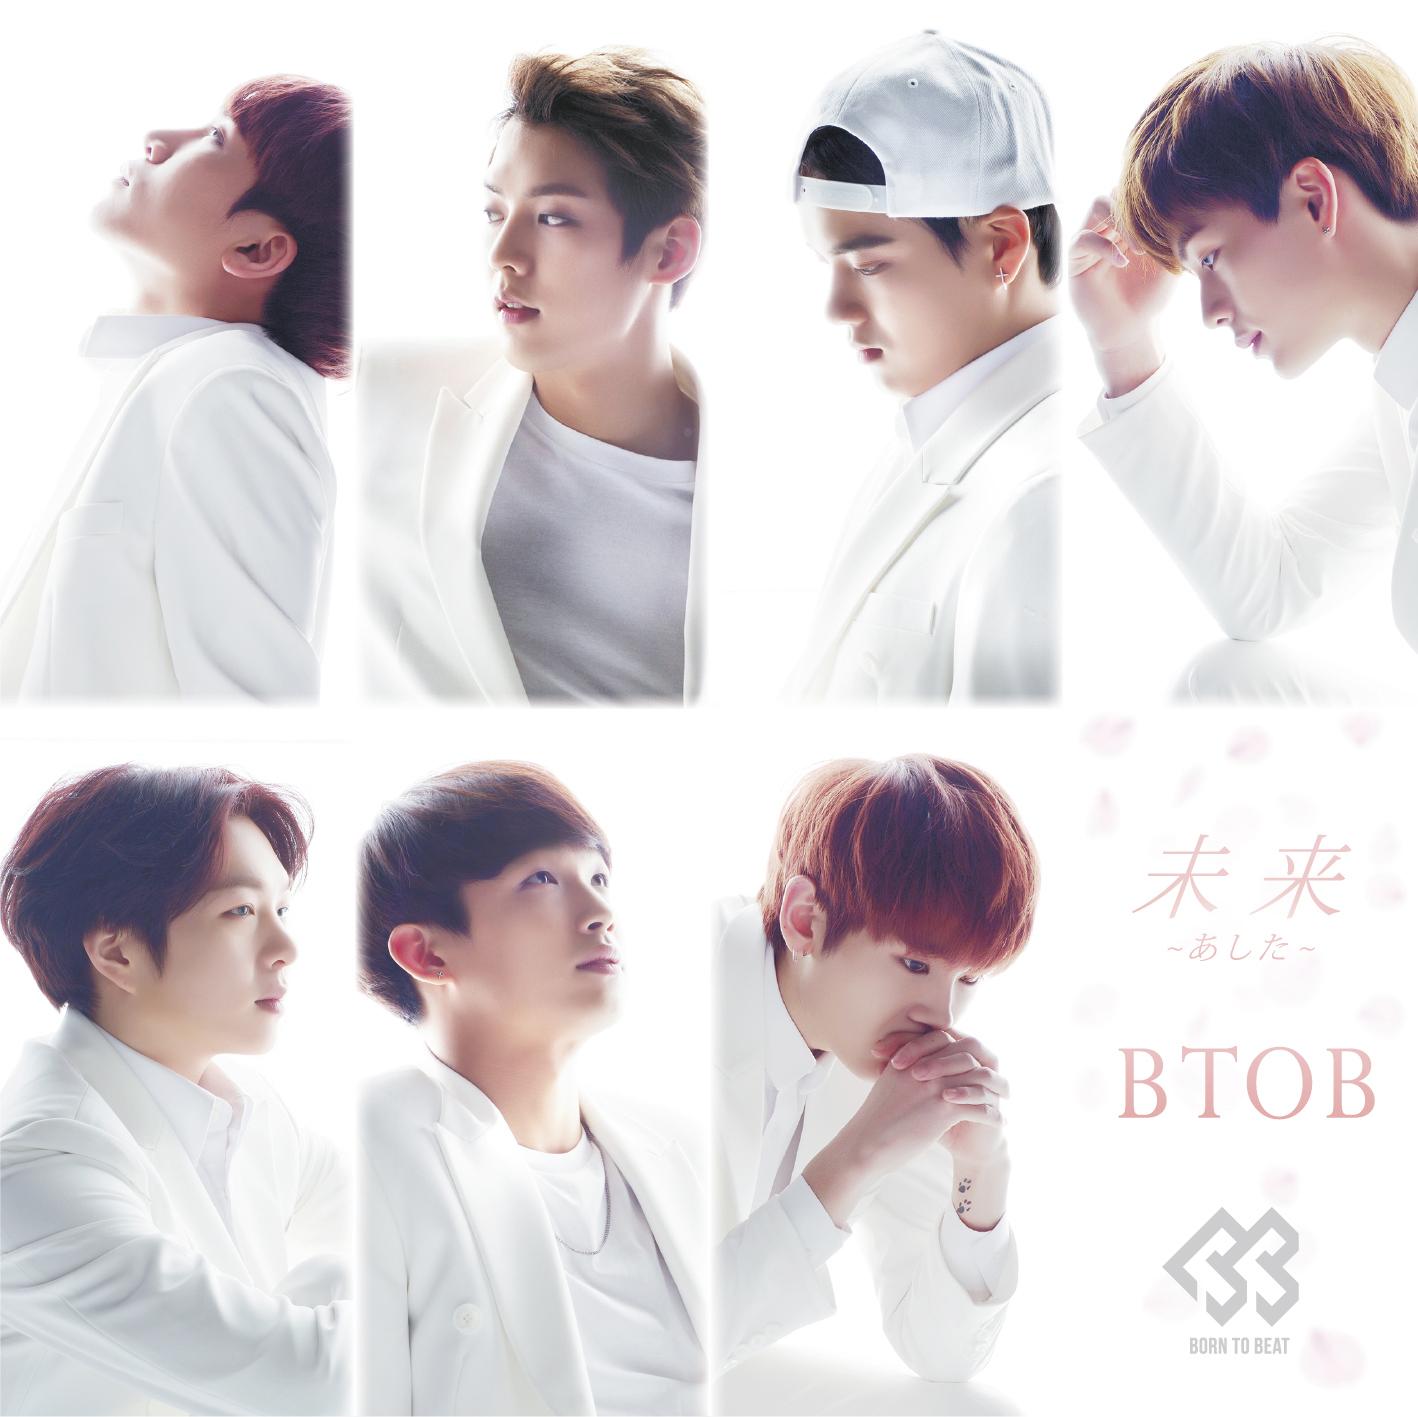 BTOB – Future (Tomorrow) [Type B] – EP (Japanese)